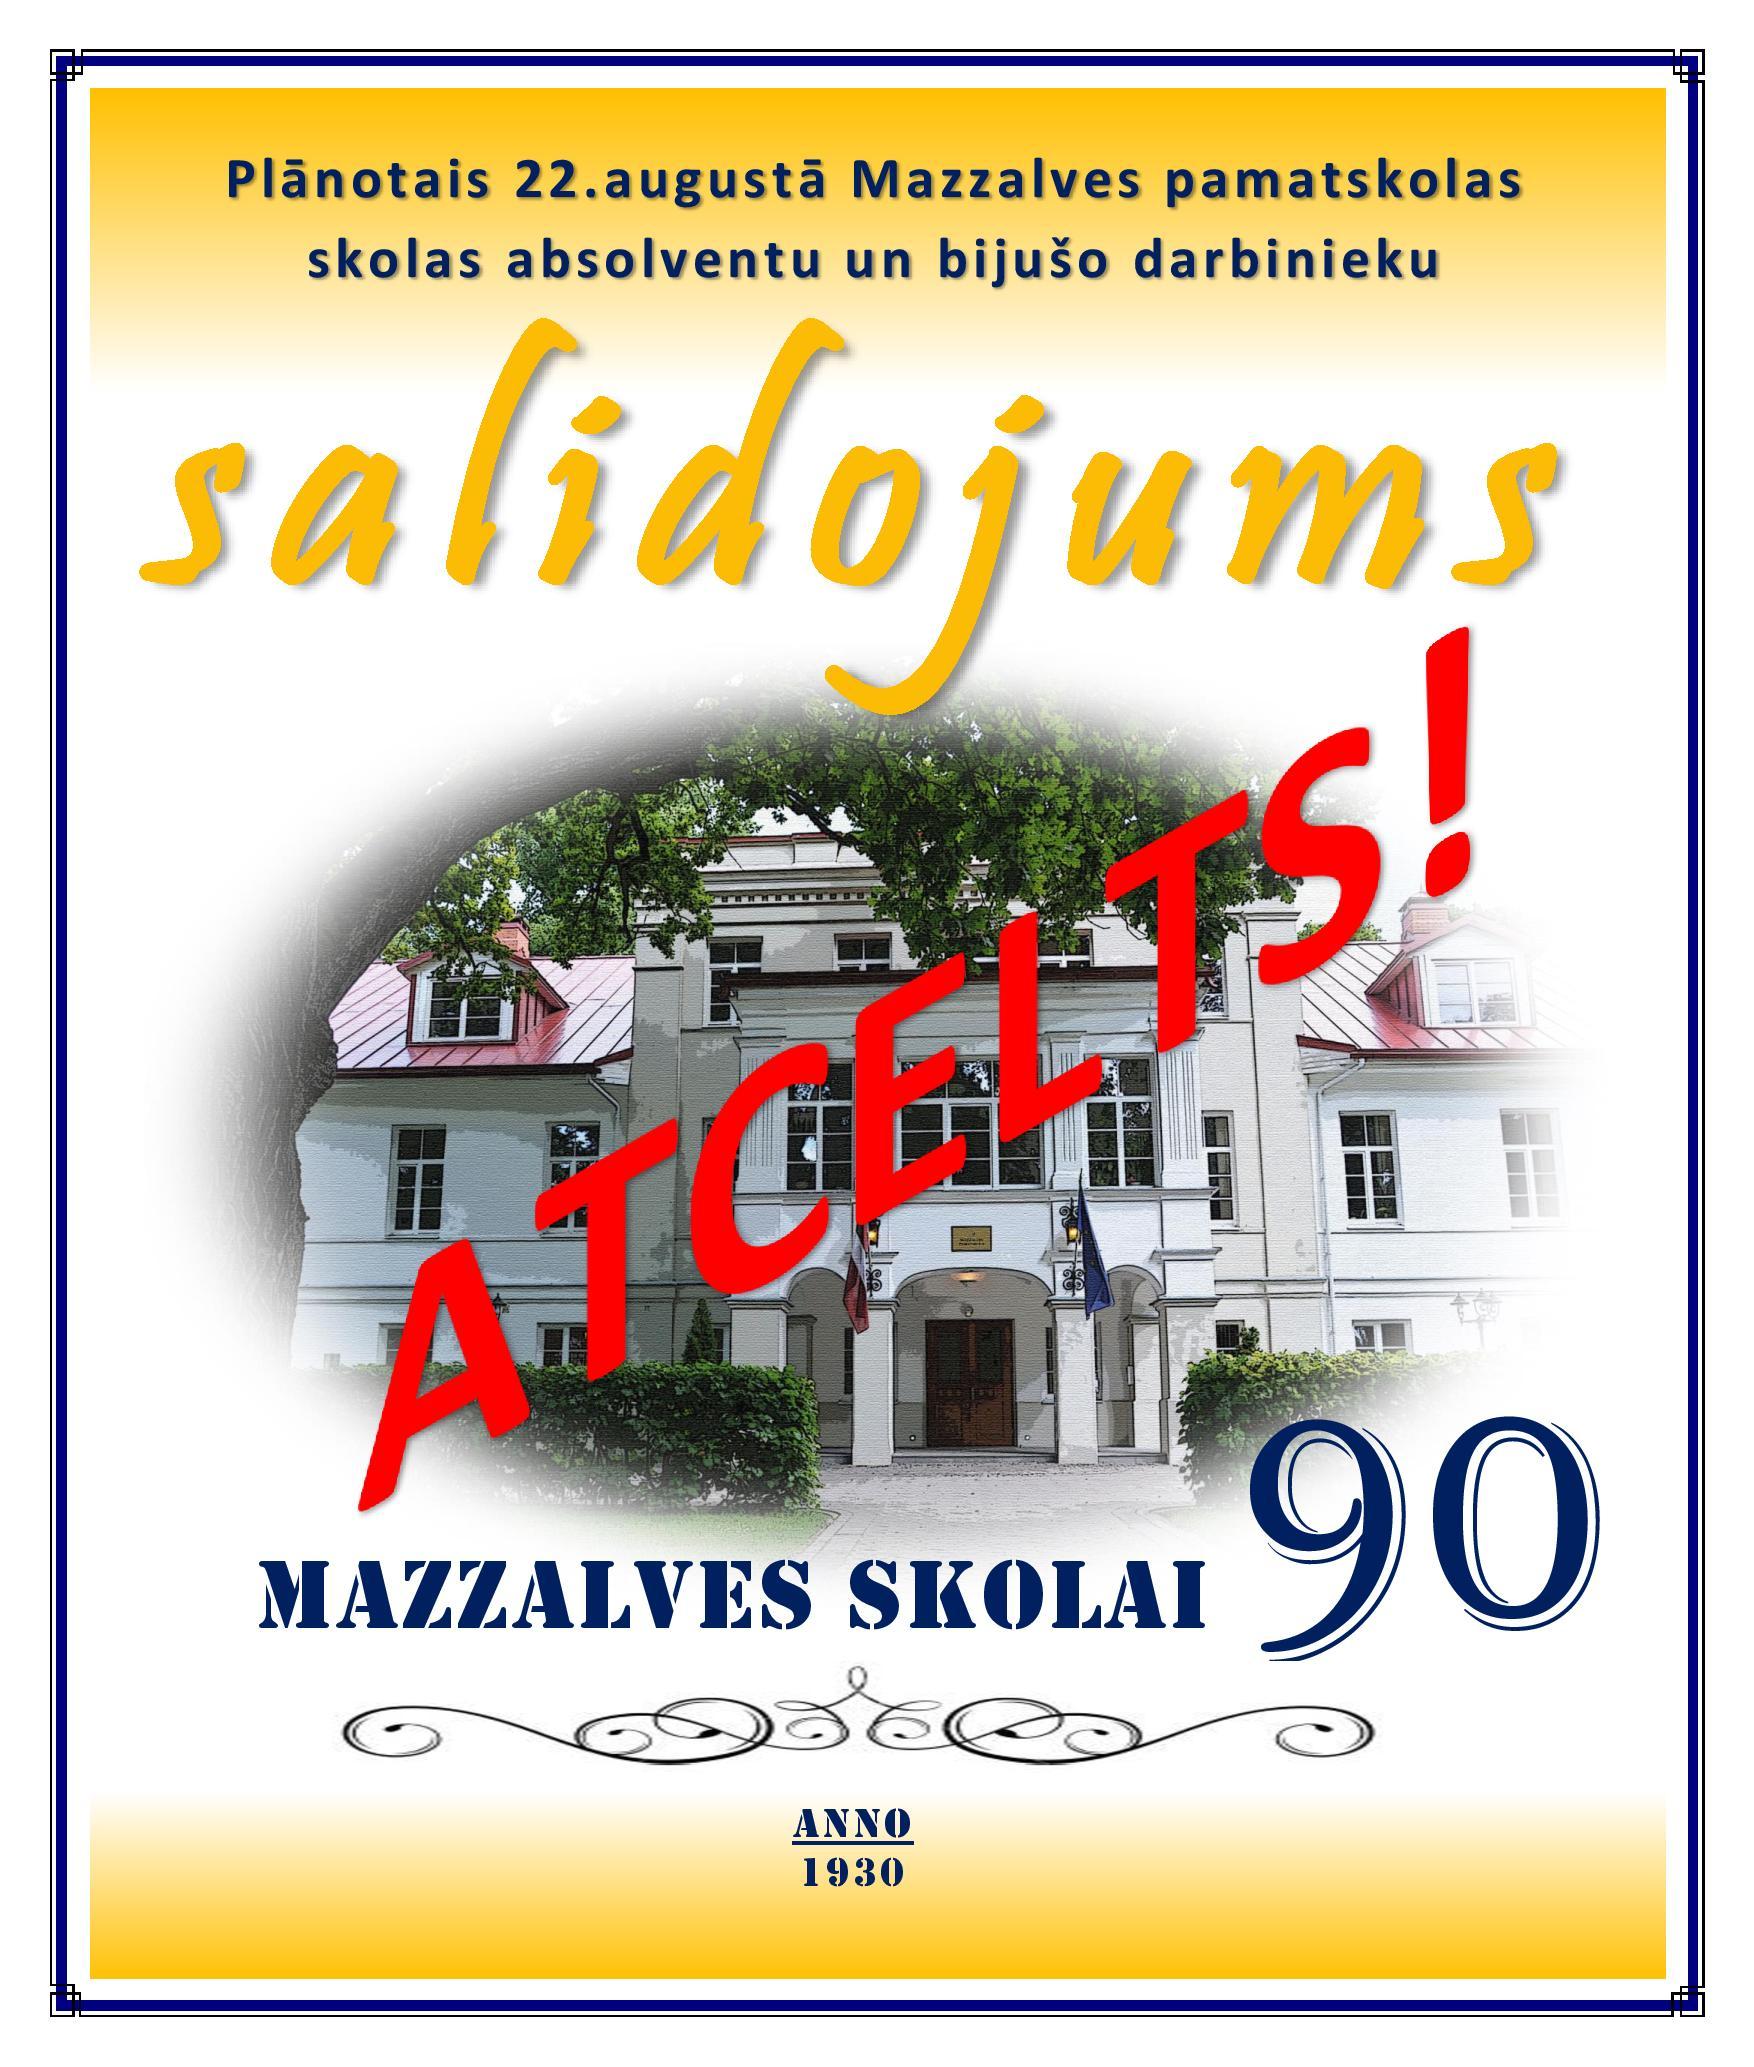 Mazzalves skolai 90 -ATCELTS